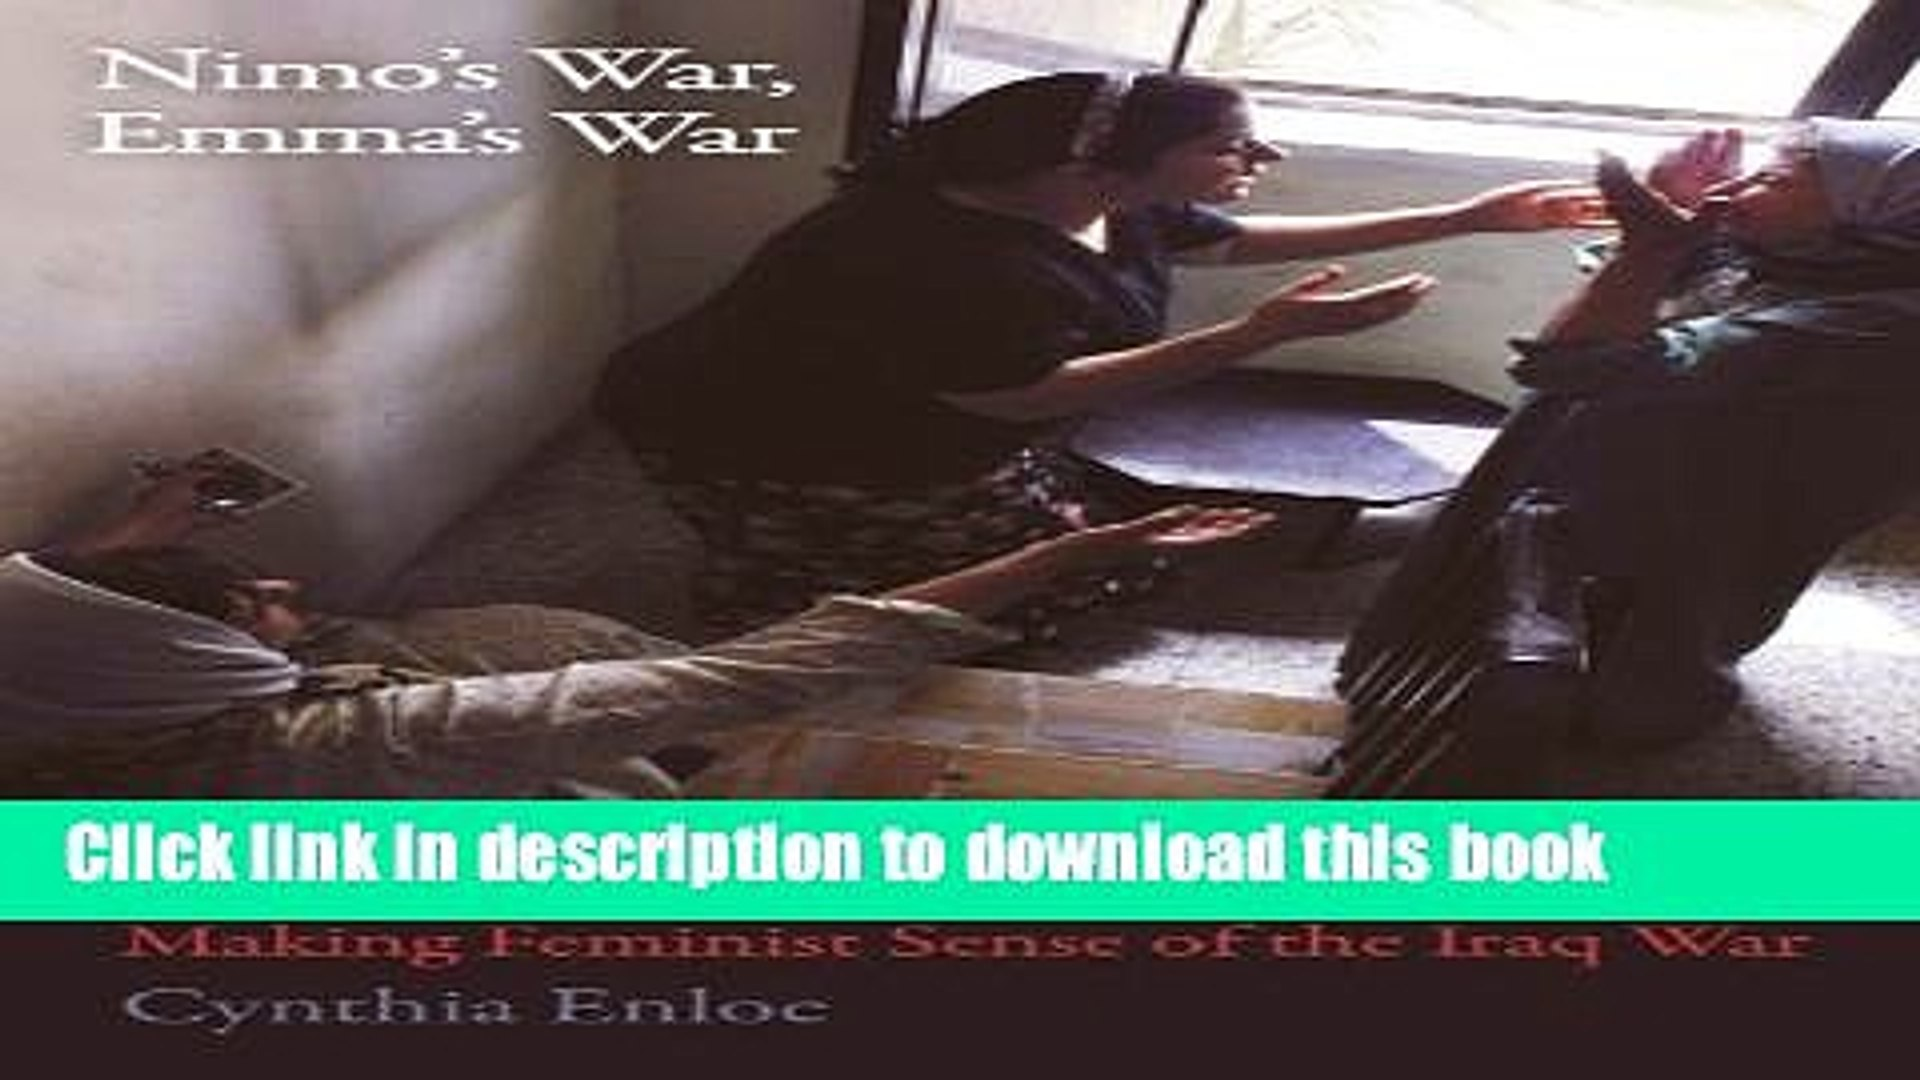 Read Books Nimo s War, Emma s War: Making Feminist Sense of the Iraq War E-Book Free